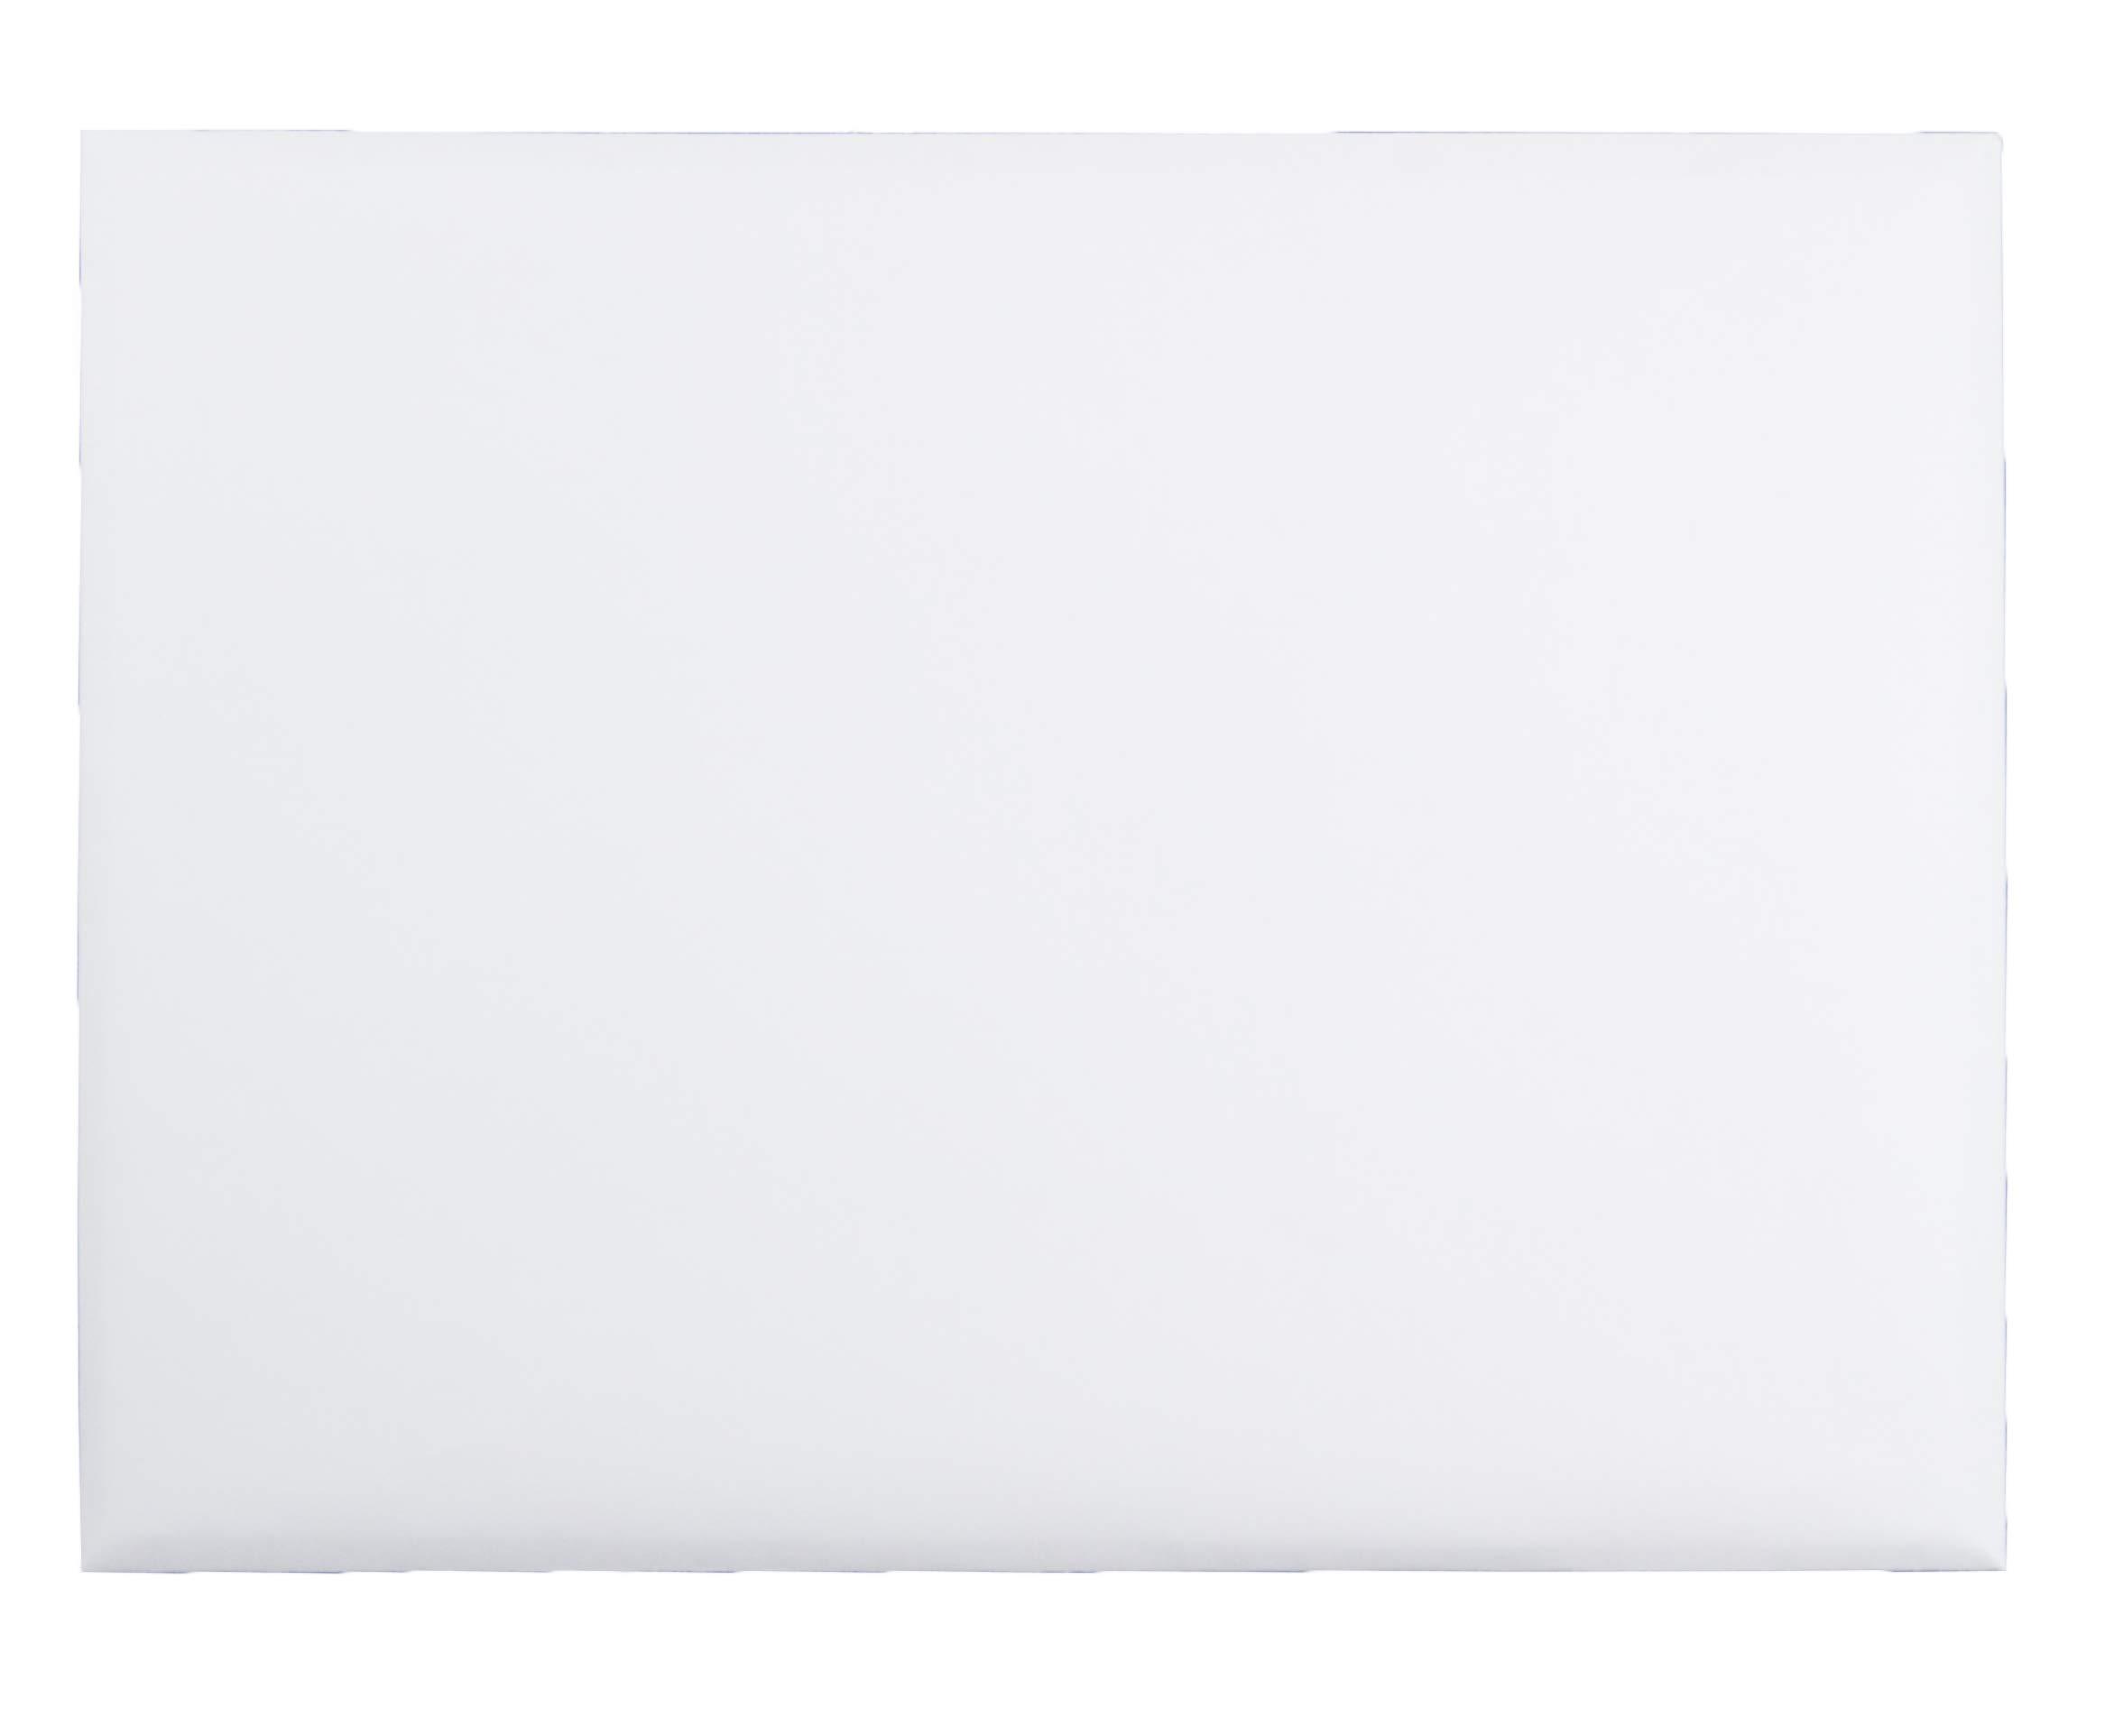 Quality Park Open-Side Booklet Envelope, Gummed, White, 9 x 12, 250 per Box, (37682) by Quality Park